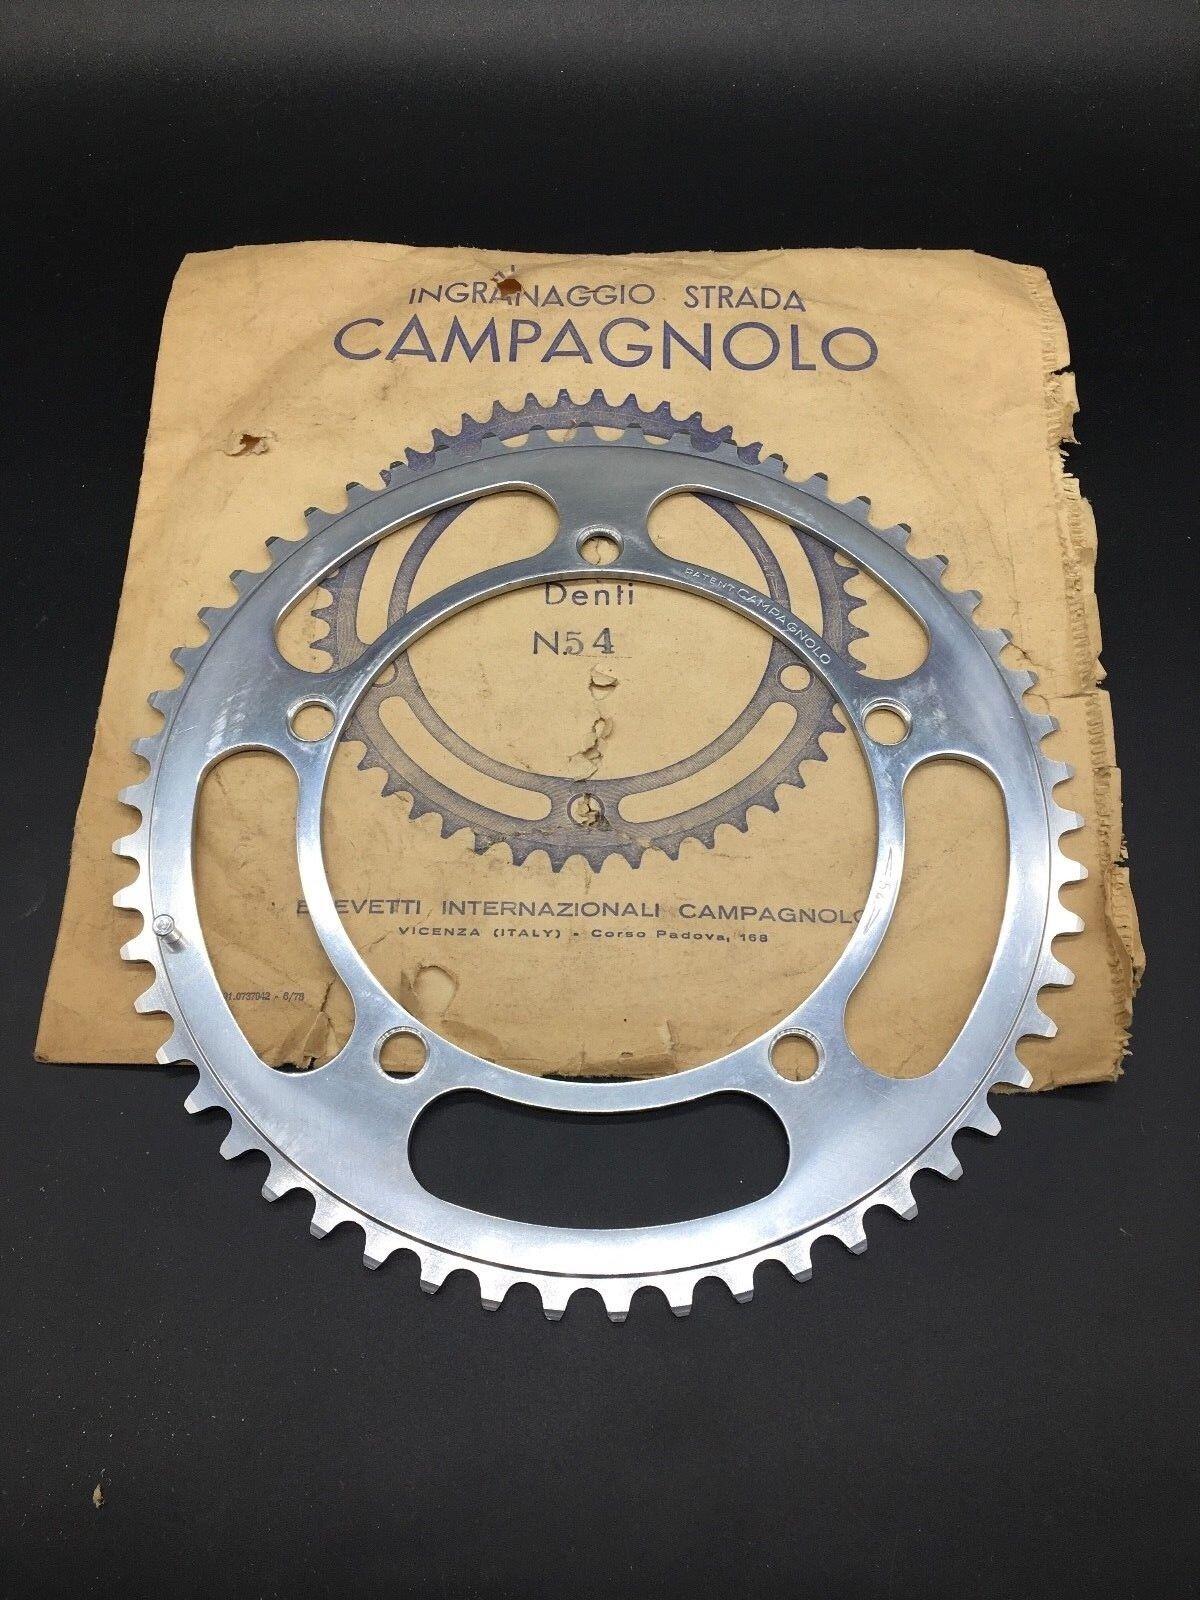 VINTAGE CAMPAGNOLO RECORD CHAINRING 54T 12 X 132 BCD 144 NIB NOS SUPER